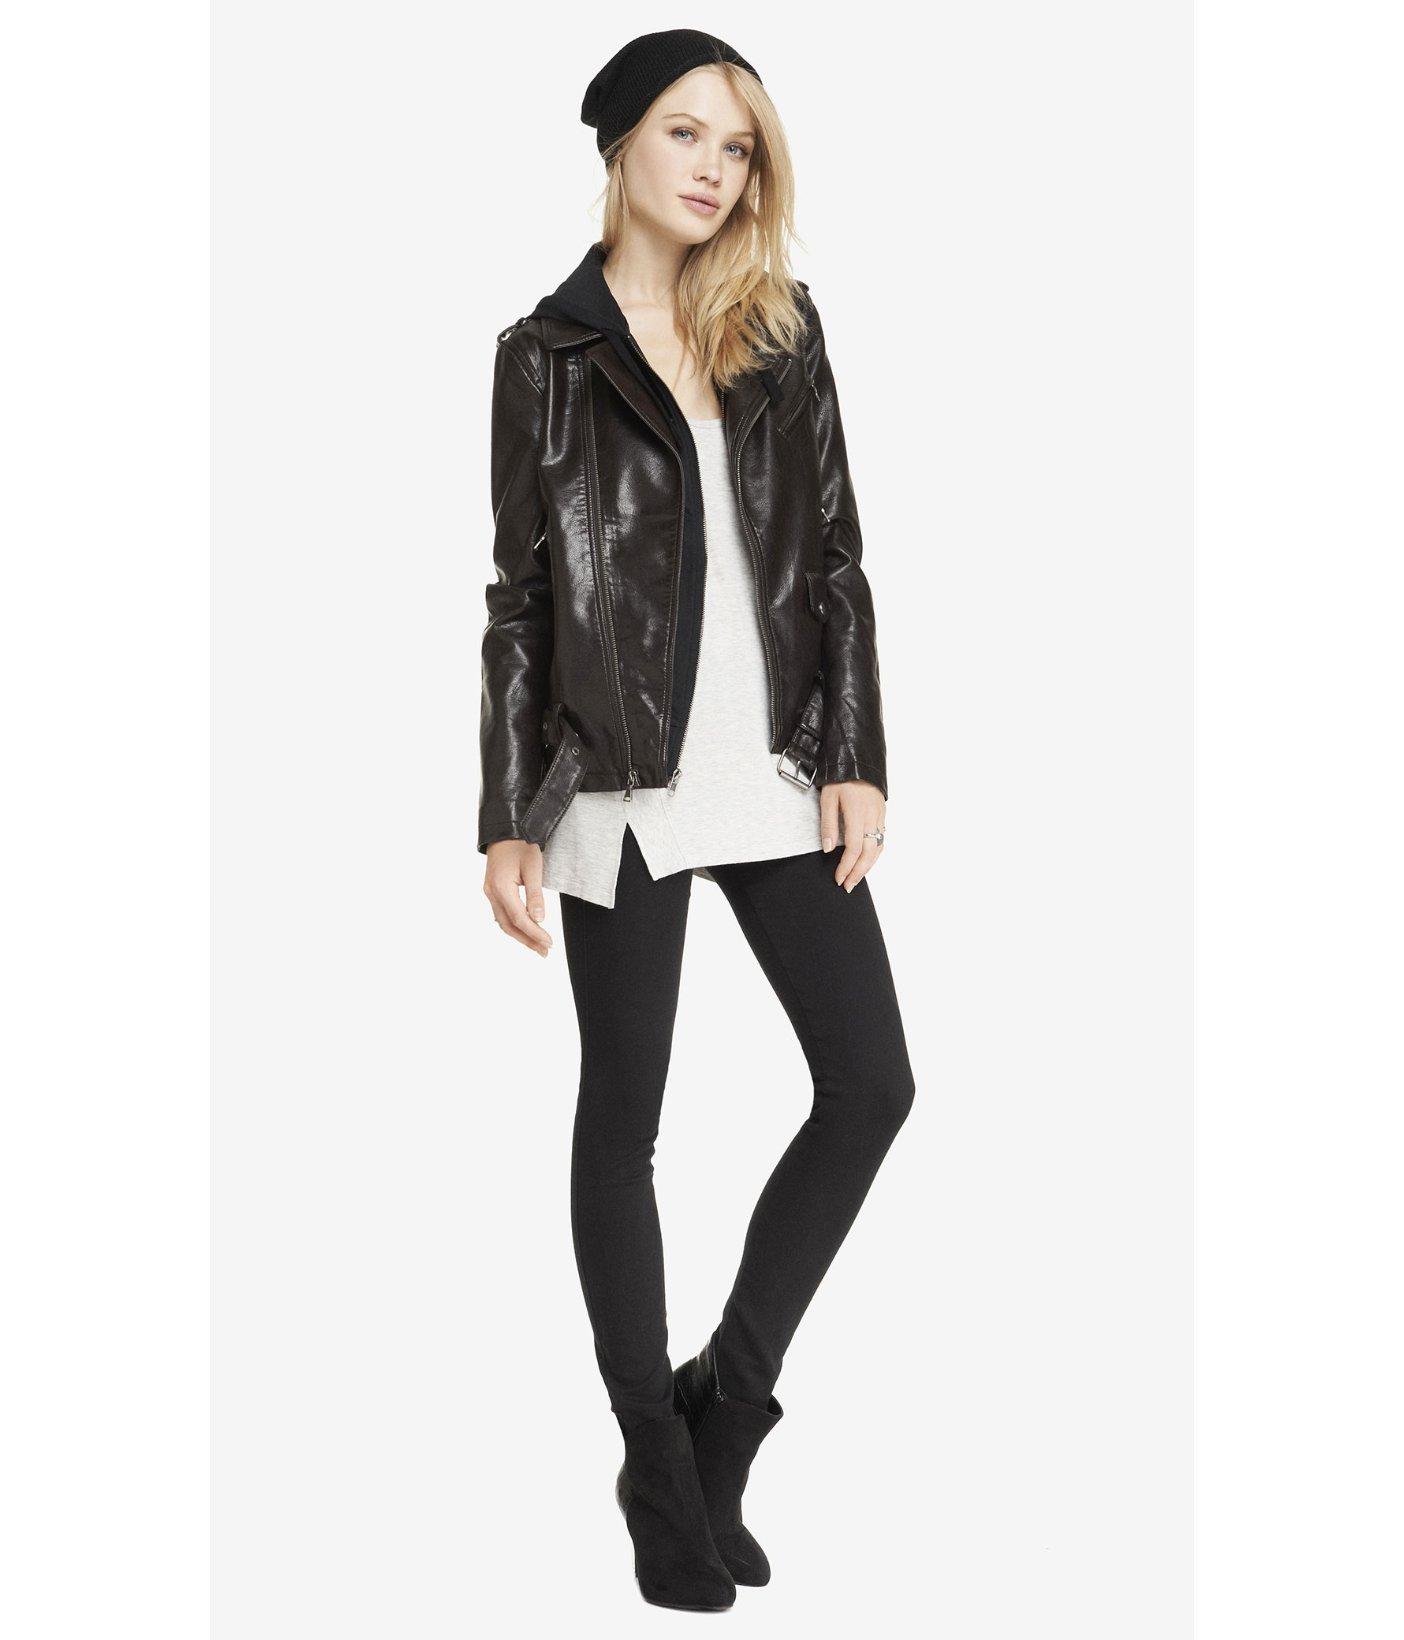 b1431c72927 Lyst - Express Dark Brown (Minus The) Leather Long Moto Jacket in Black